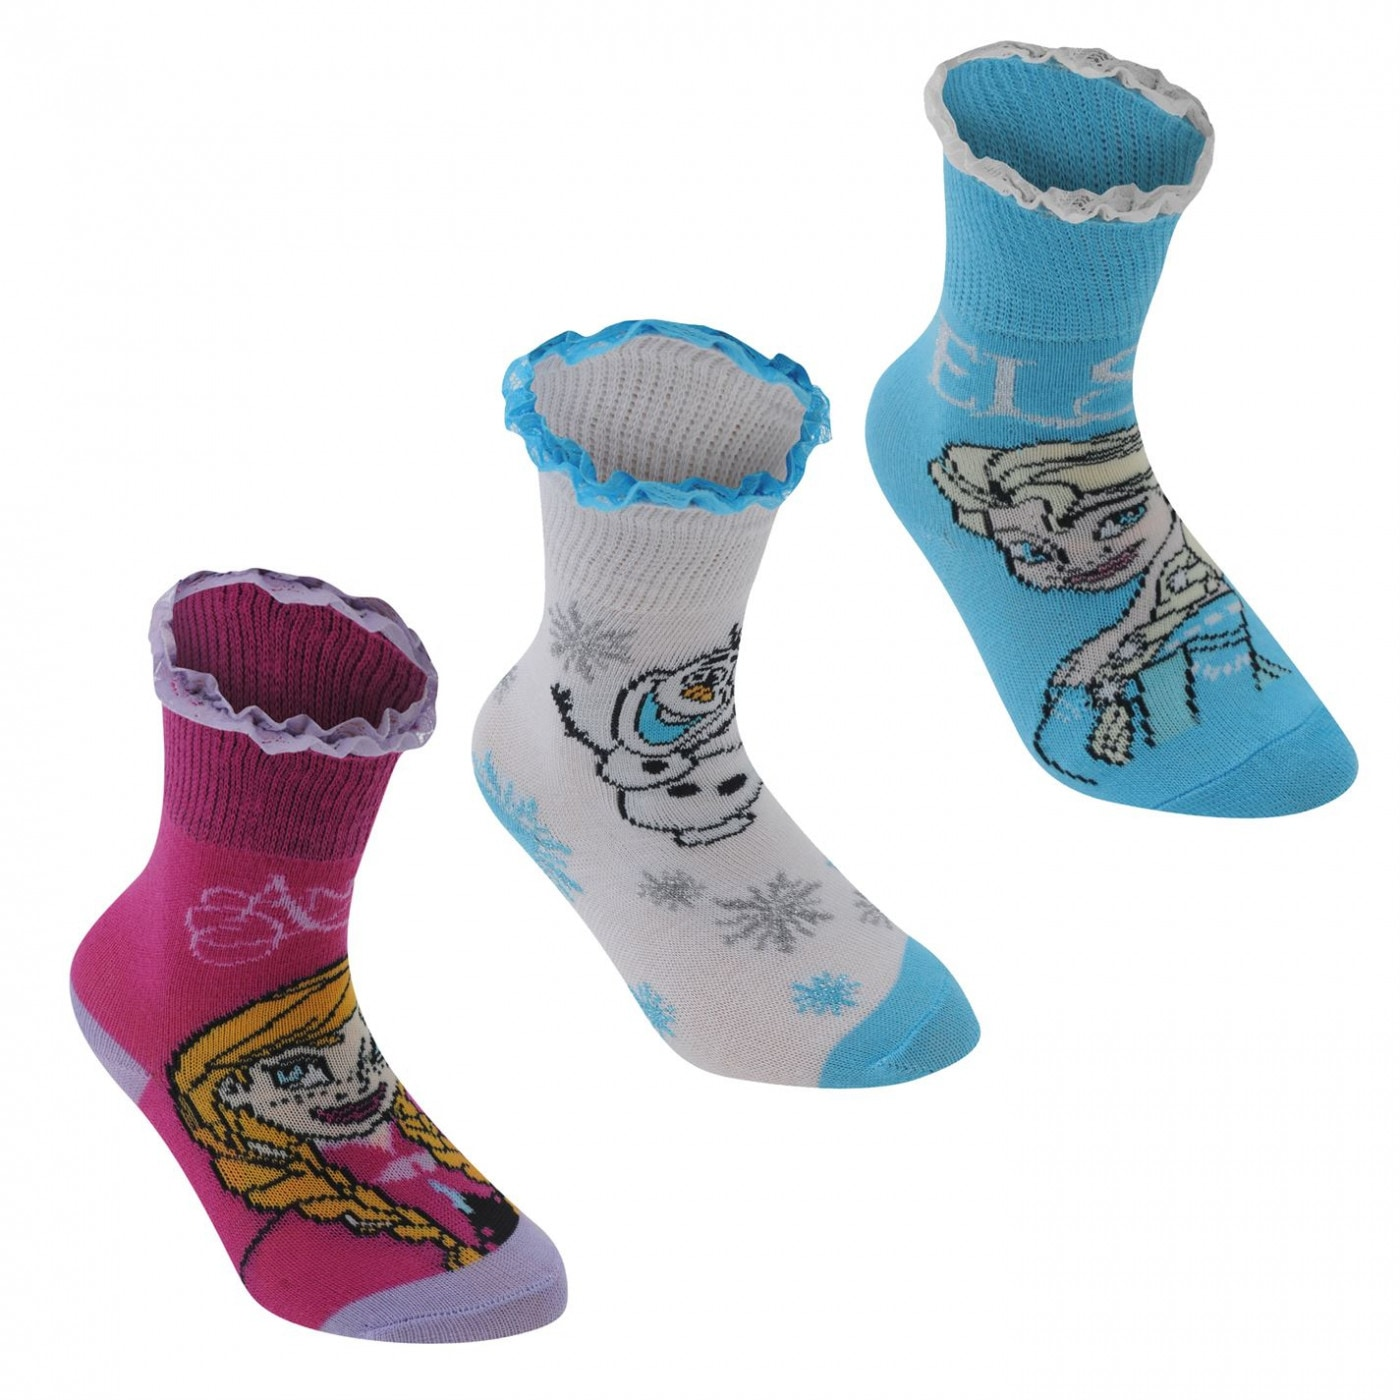 Disney 3 pack Crew Sock Girls